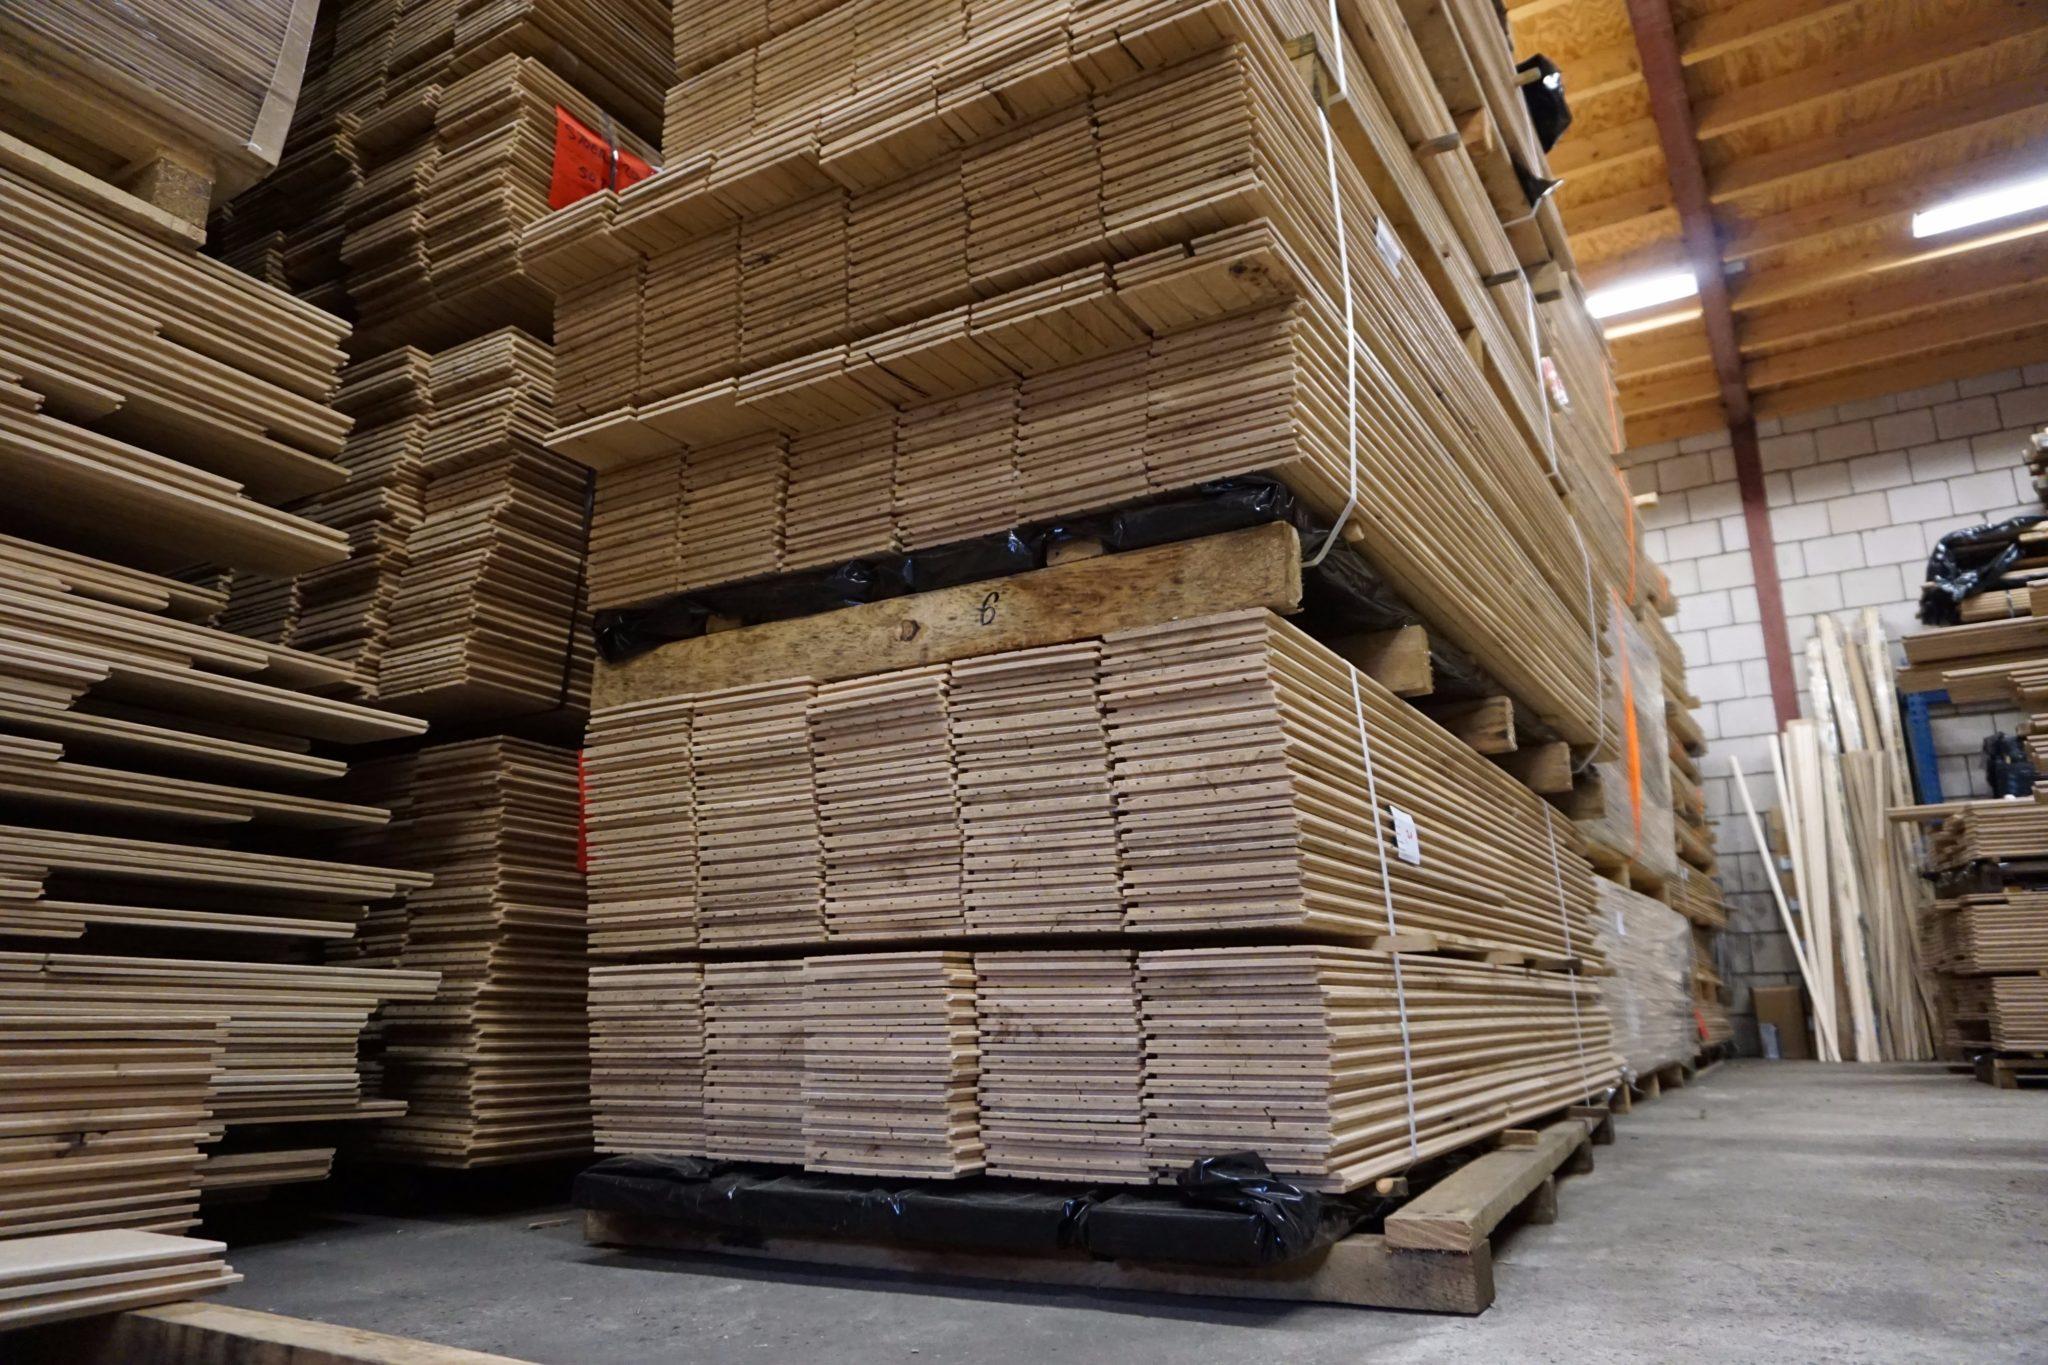 Vinyl Vloer Outlet : Vloer houten outlet pvc vloeren leeuwarden nieuw keuken vloeren